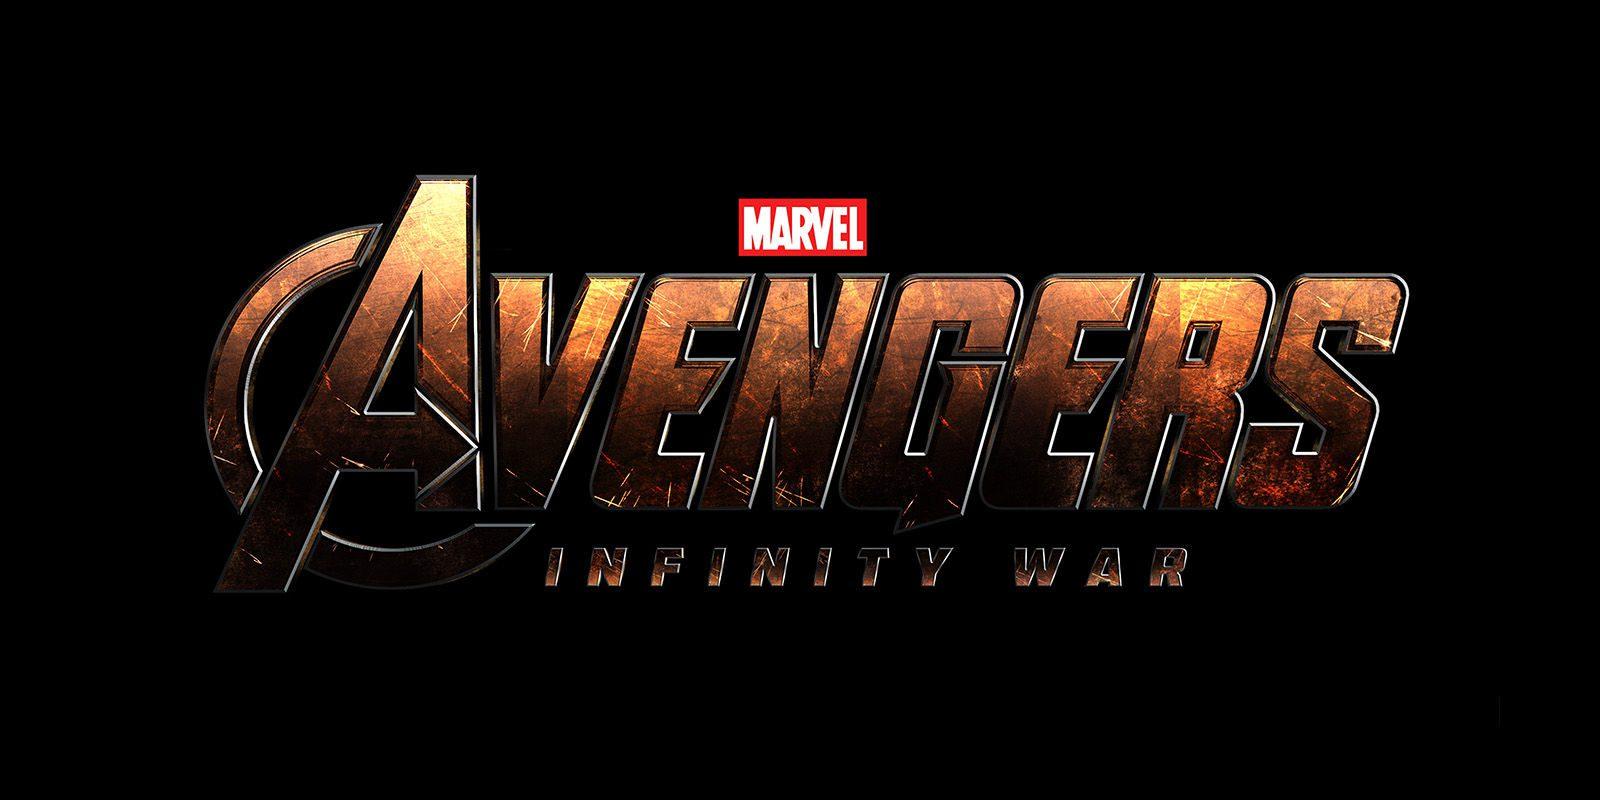 Marvel Studios Releases First Look Video of Avengers: Infinity War